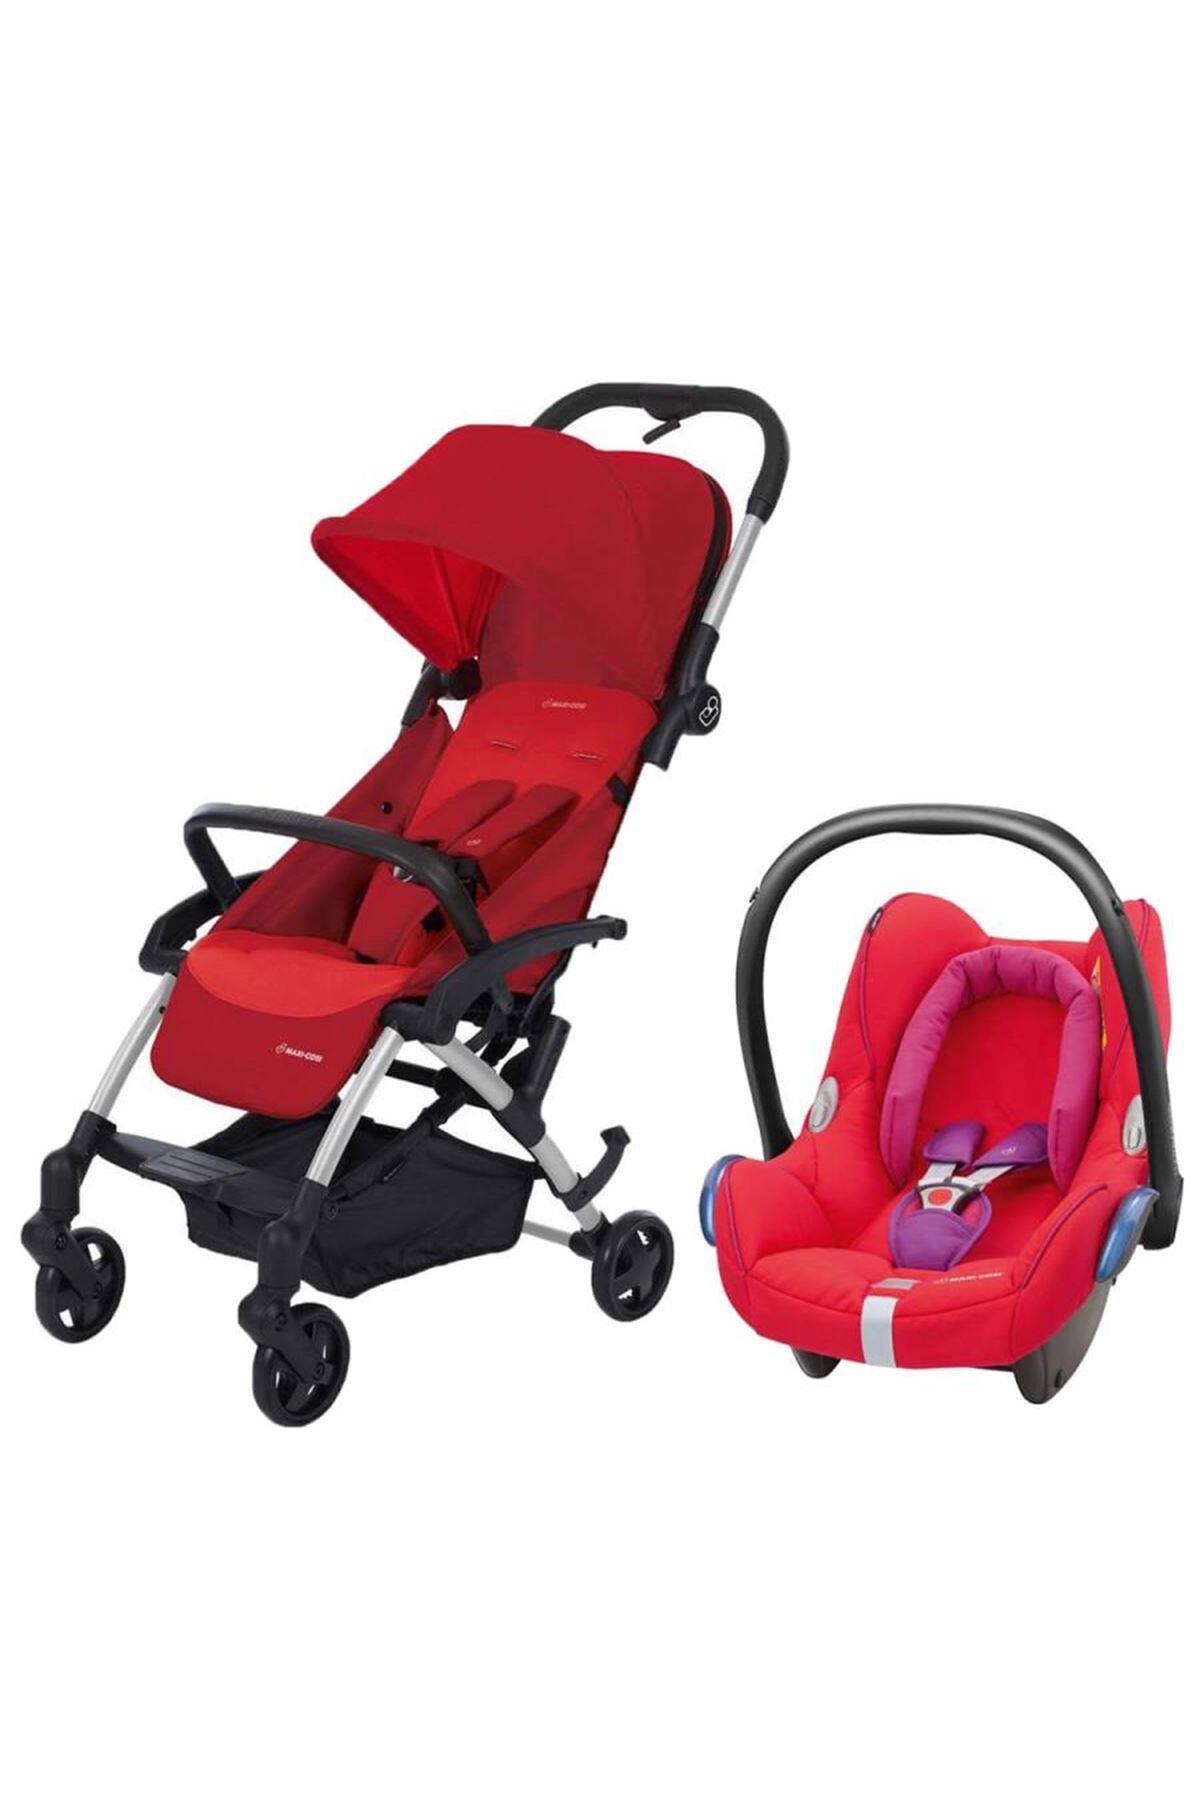 Maxi-Cosi Laika Travel Sistem Bebek Arabası / Vivid Red